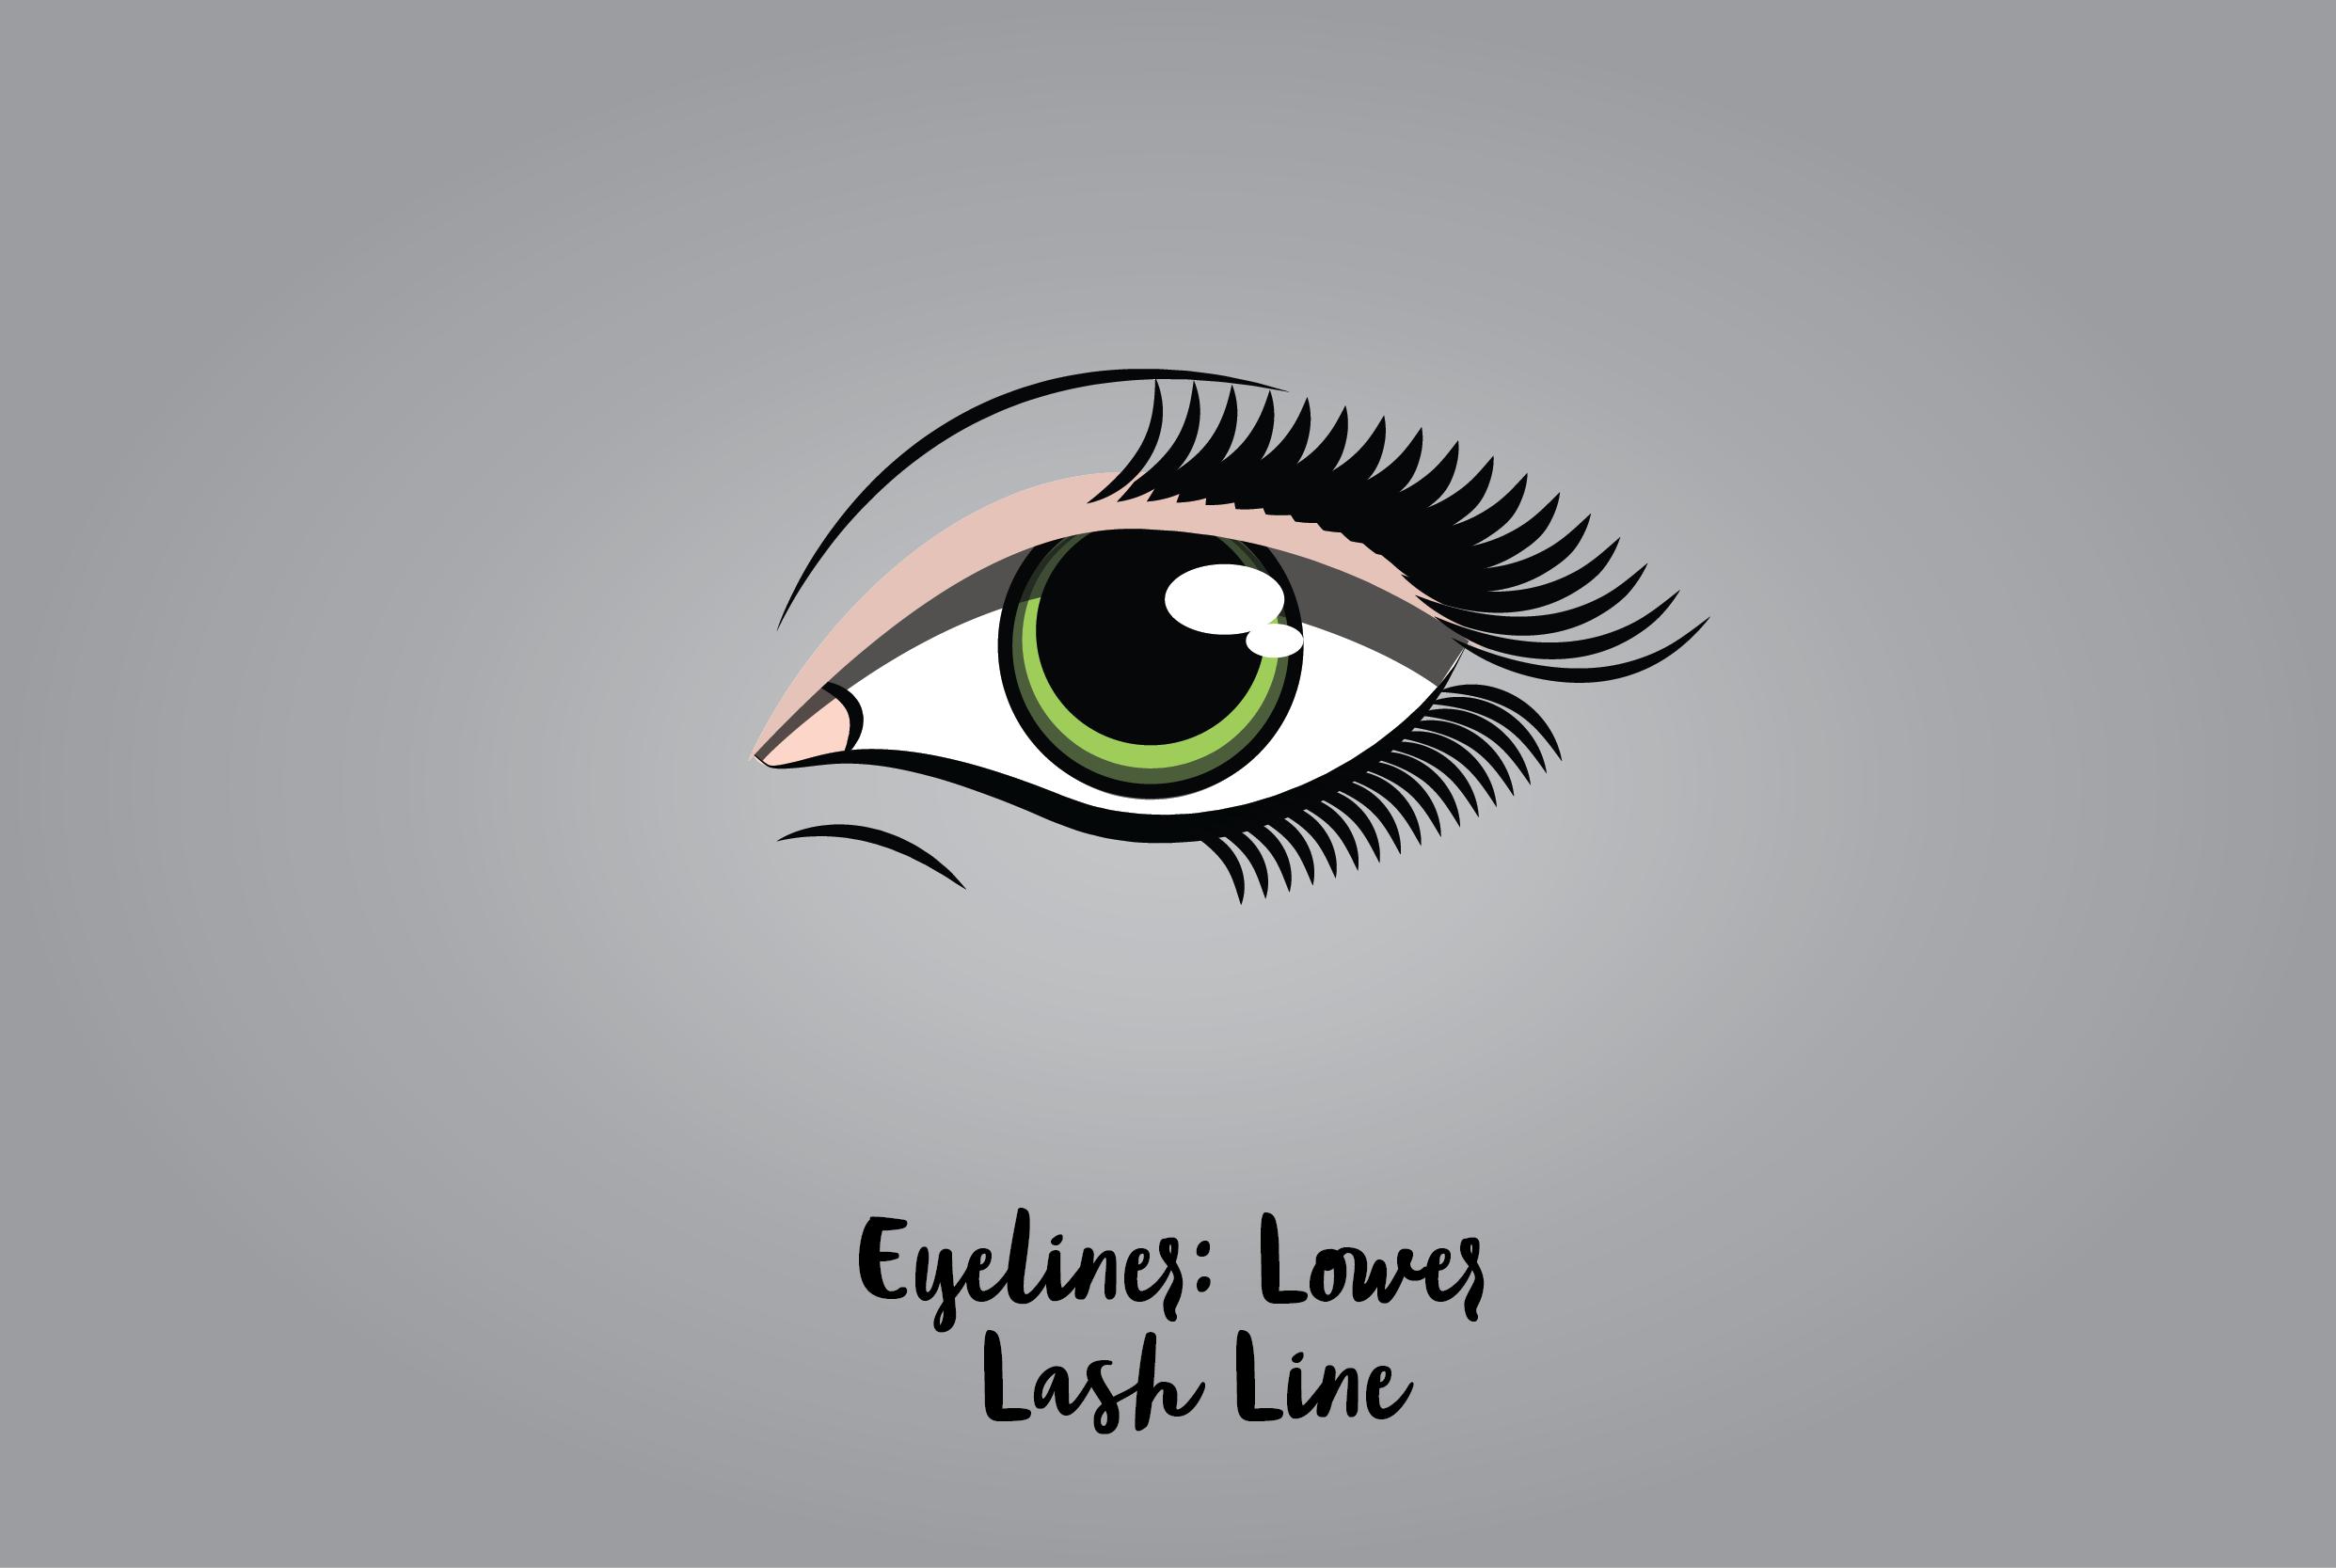 Eyeliner: Lower Lash Line